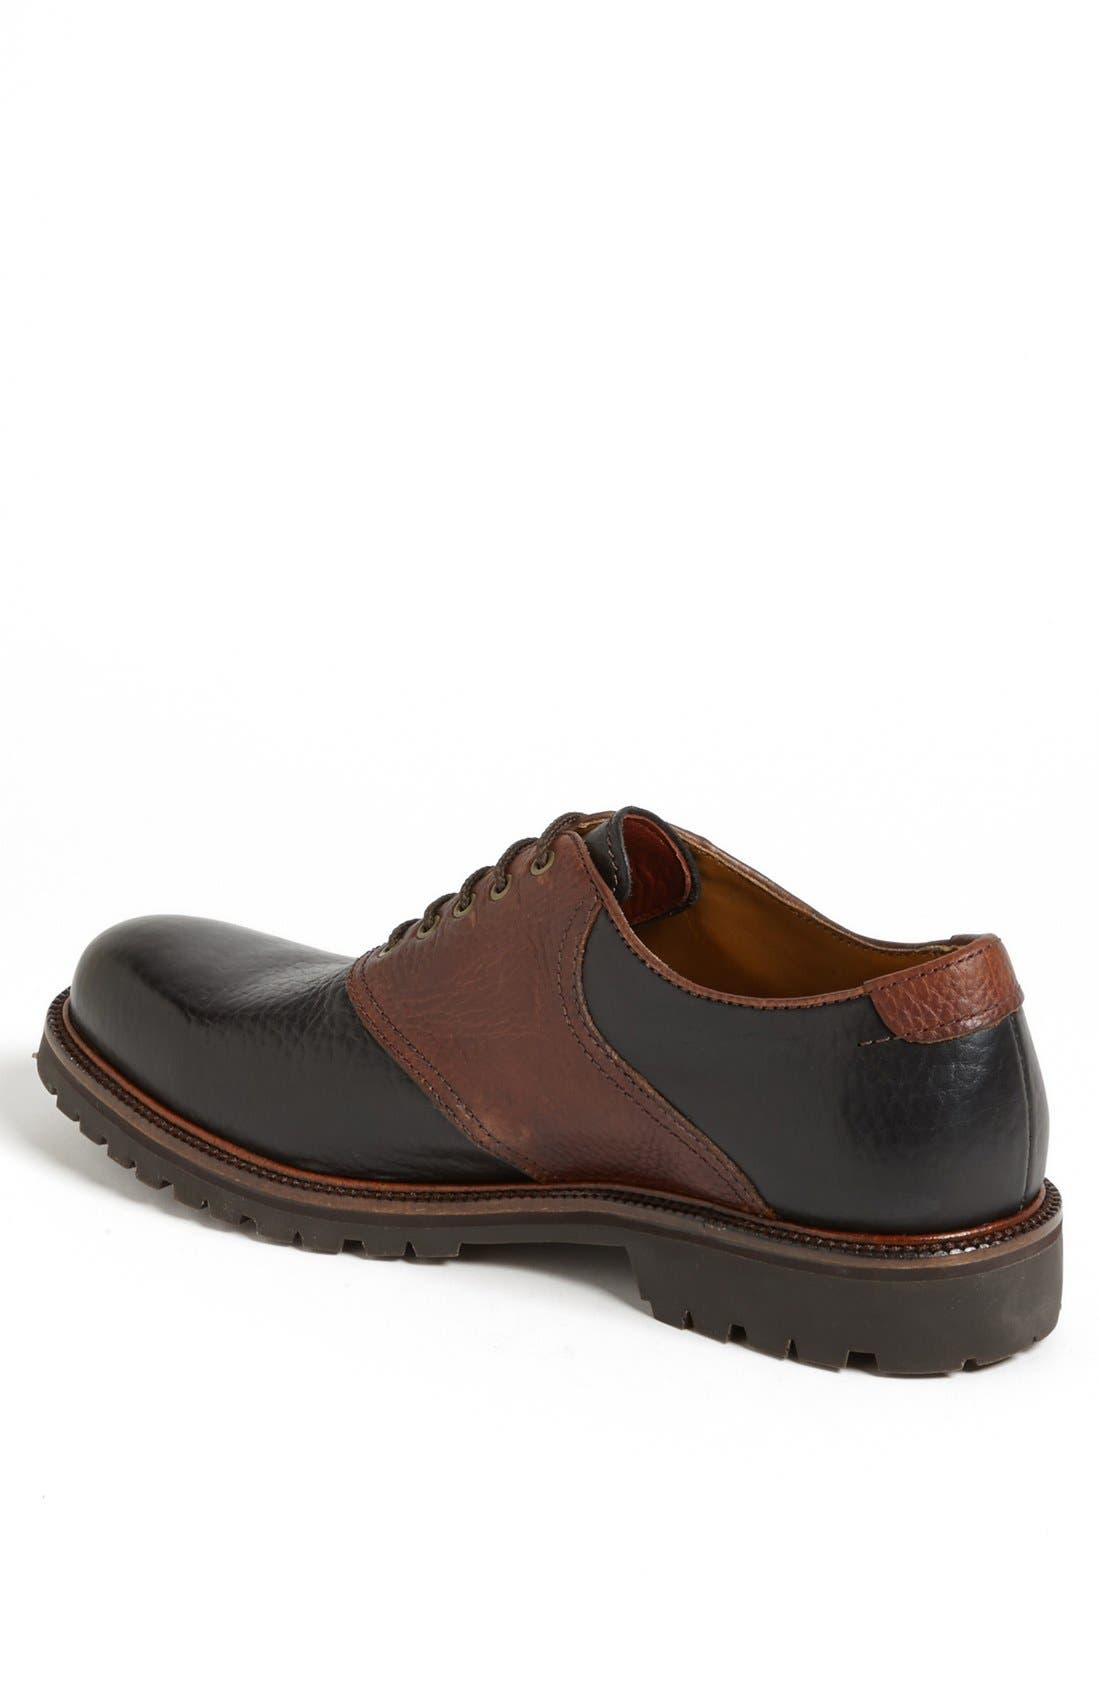 Alternate Image 2  - Trask 'Garland' Saddle Shoe (Men)